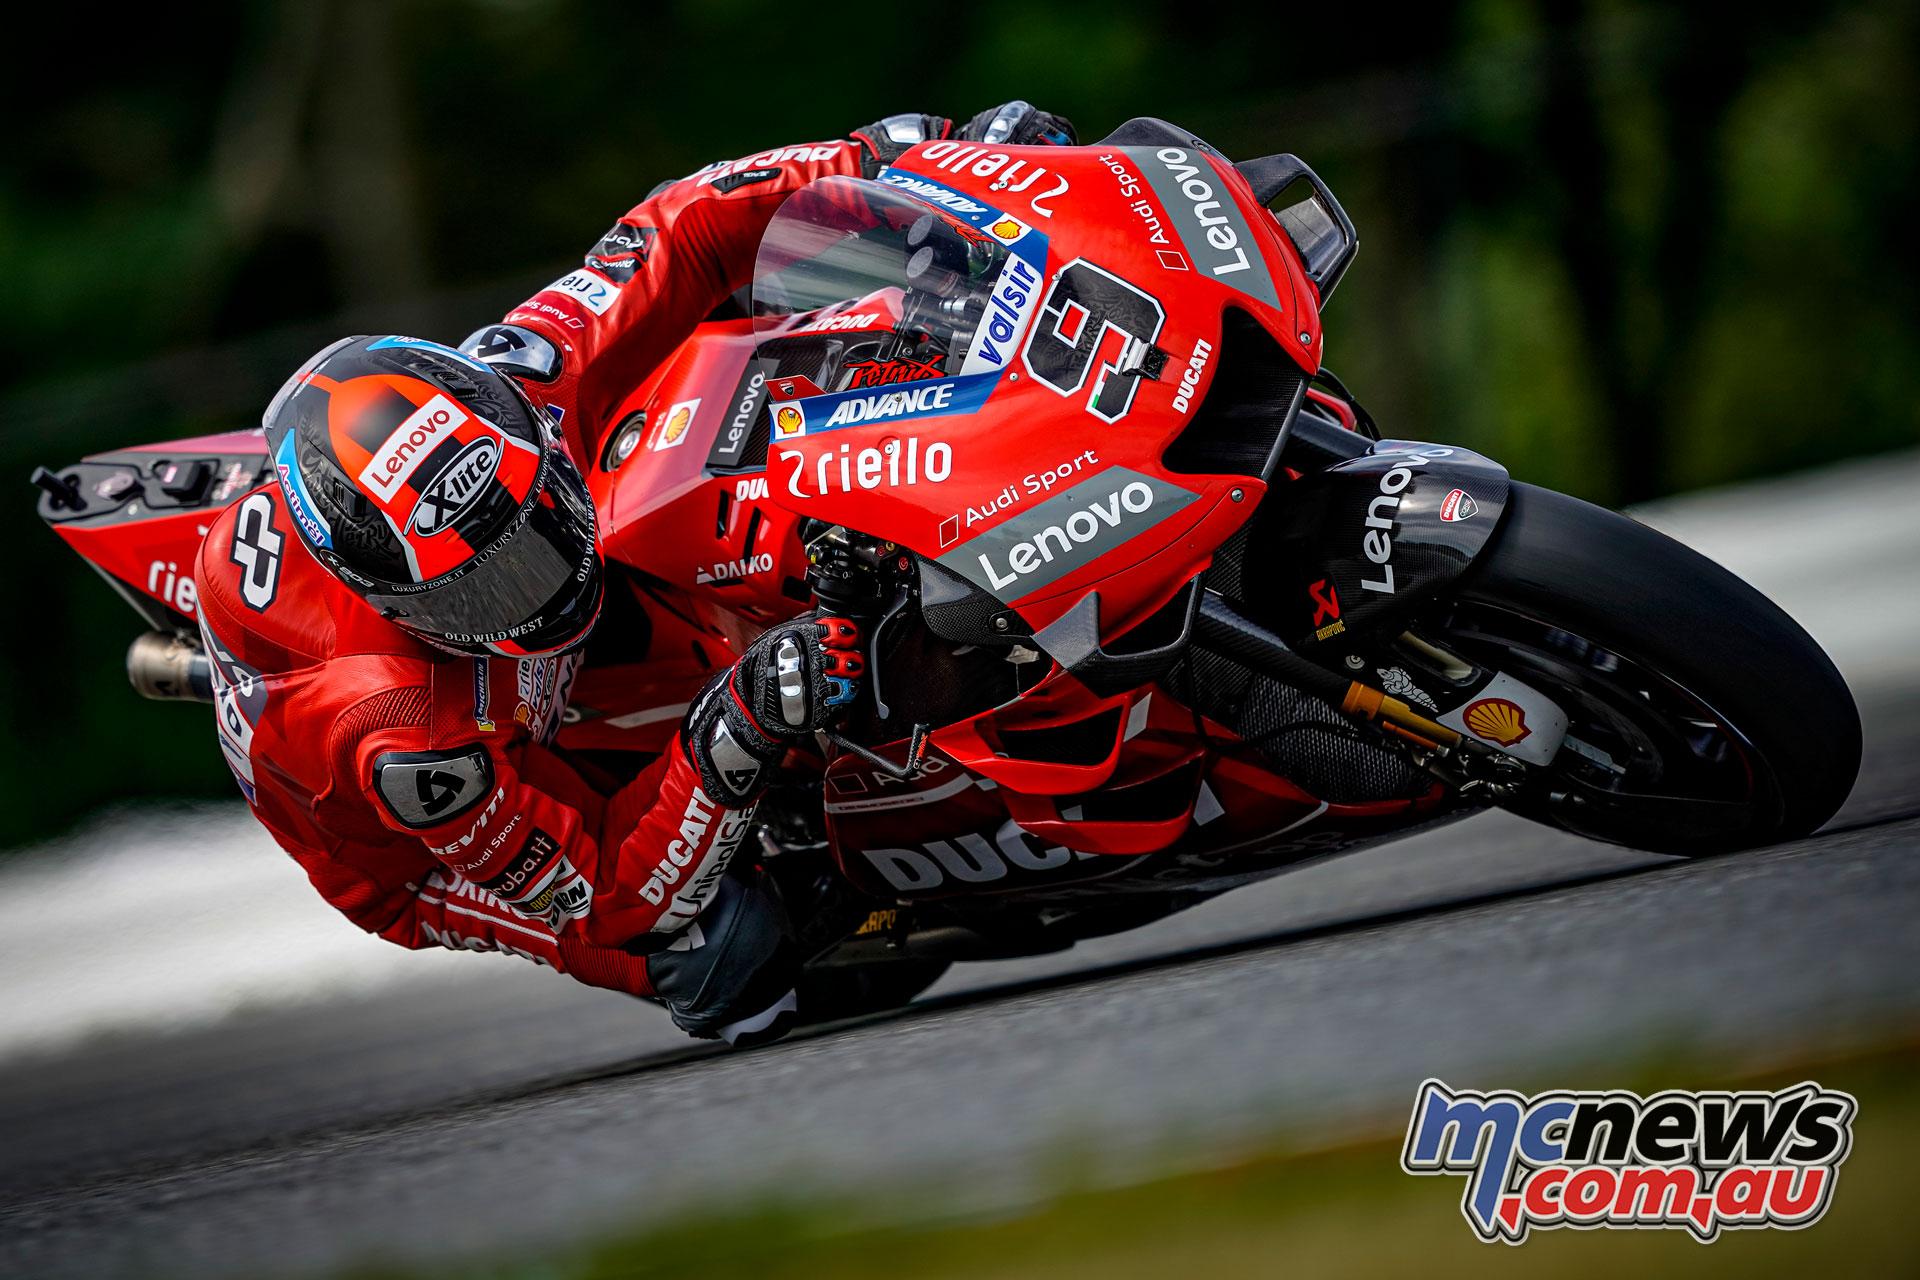 MotoGP Brno Test Danilo Petrucci